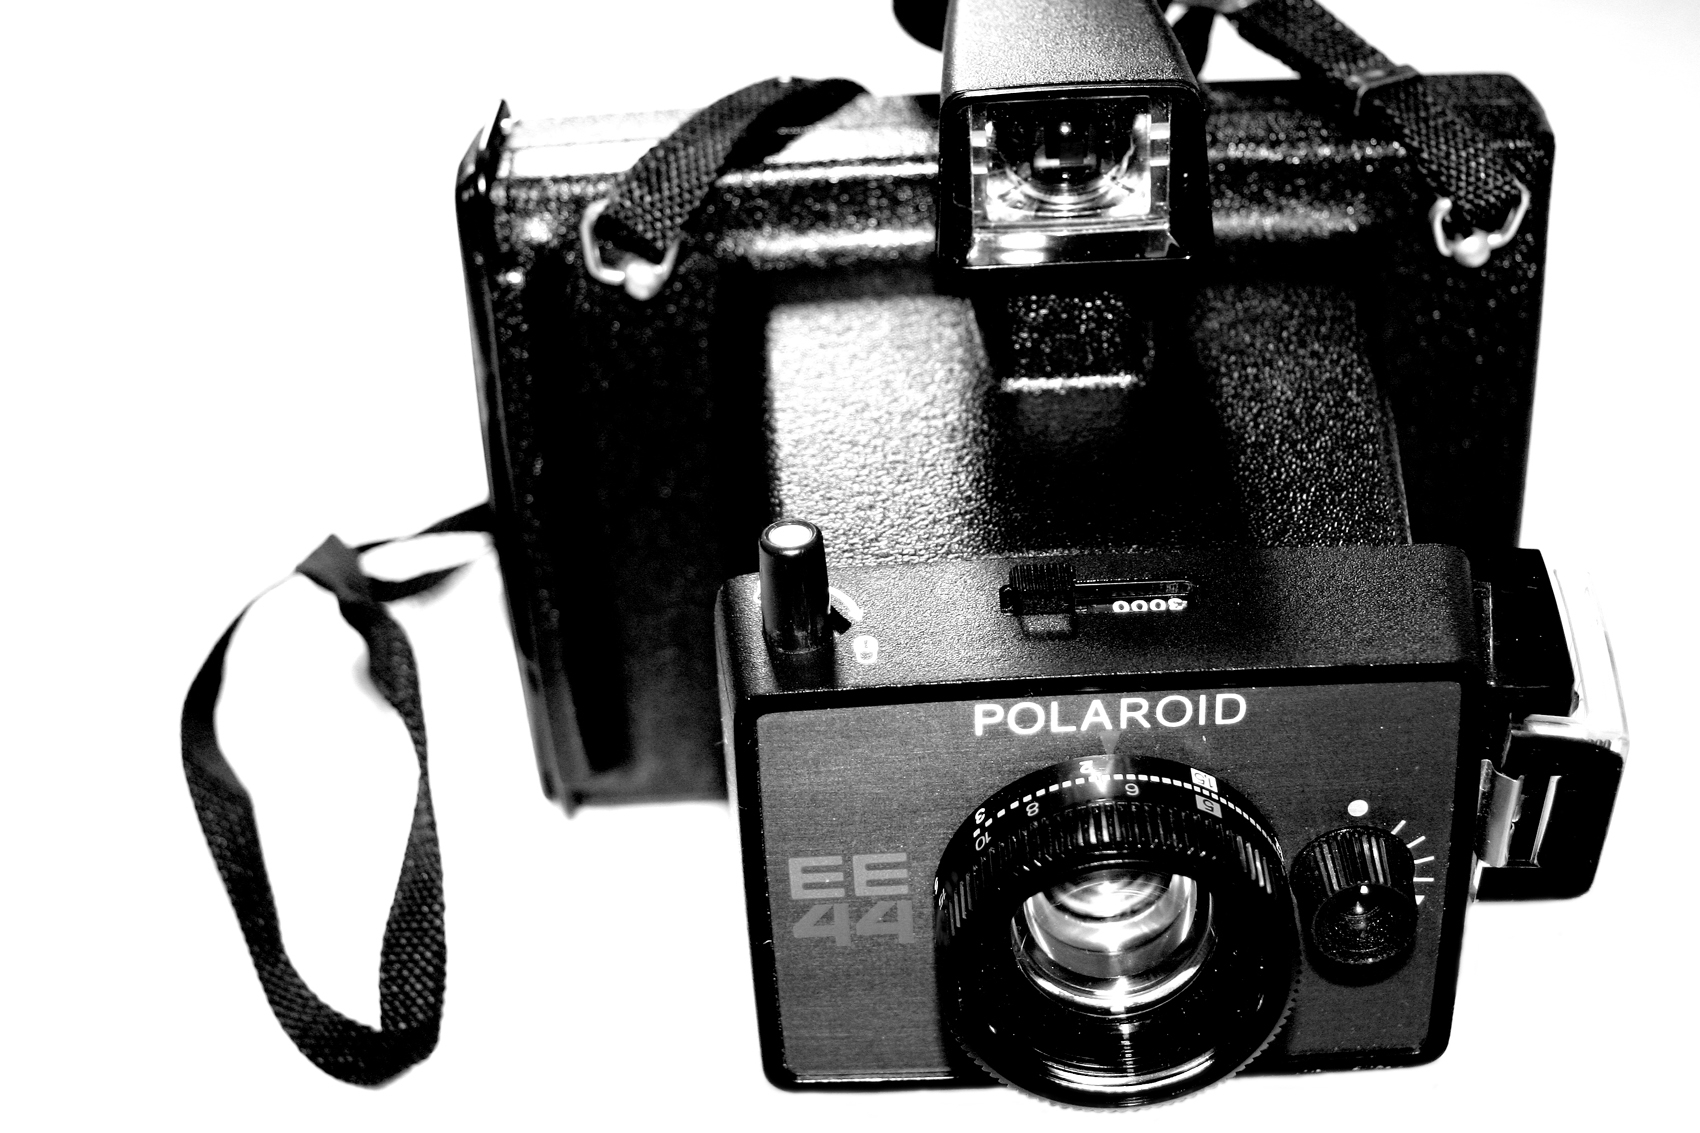 Old polaroid camera, Black, Camera, Flash, Old, HQ Photo